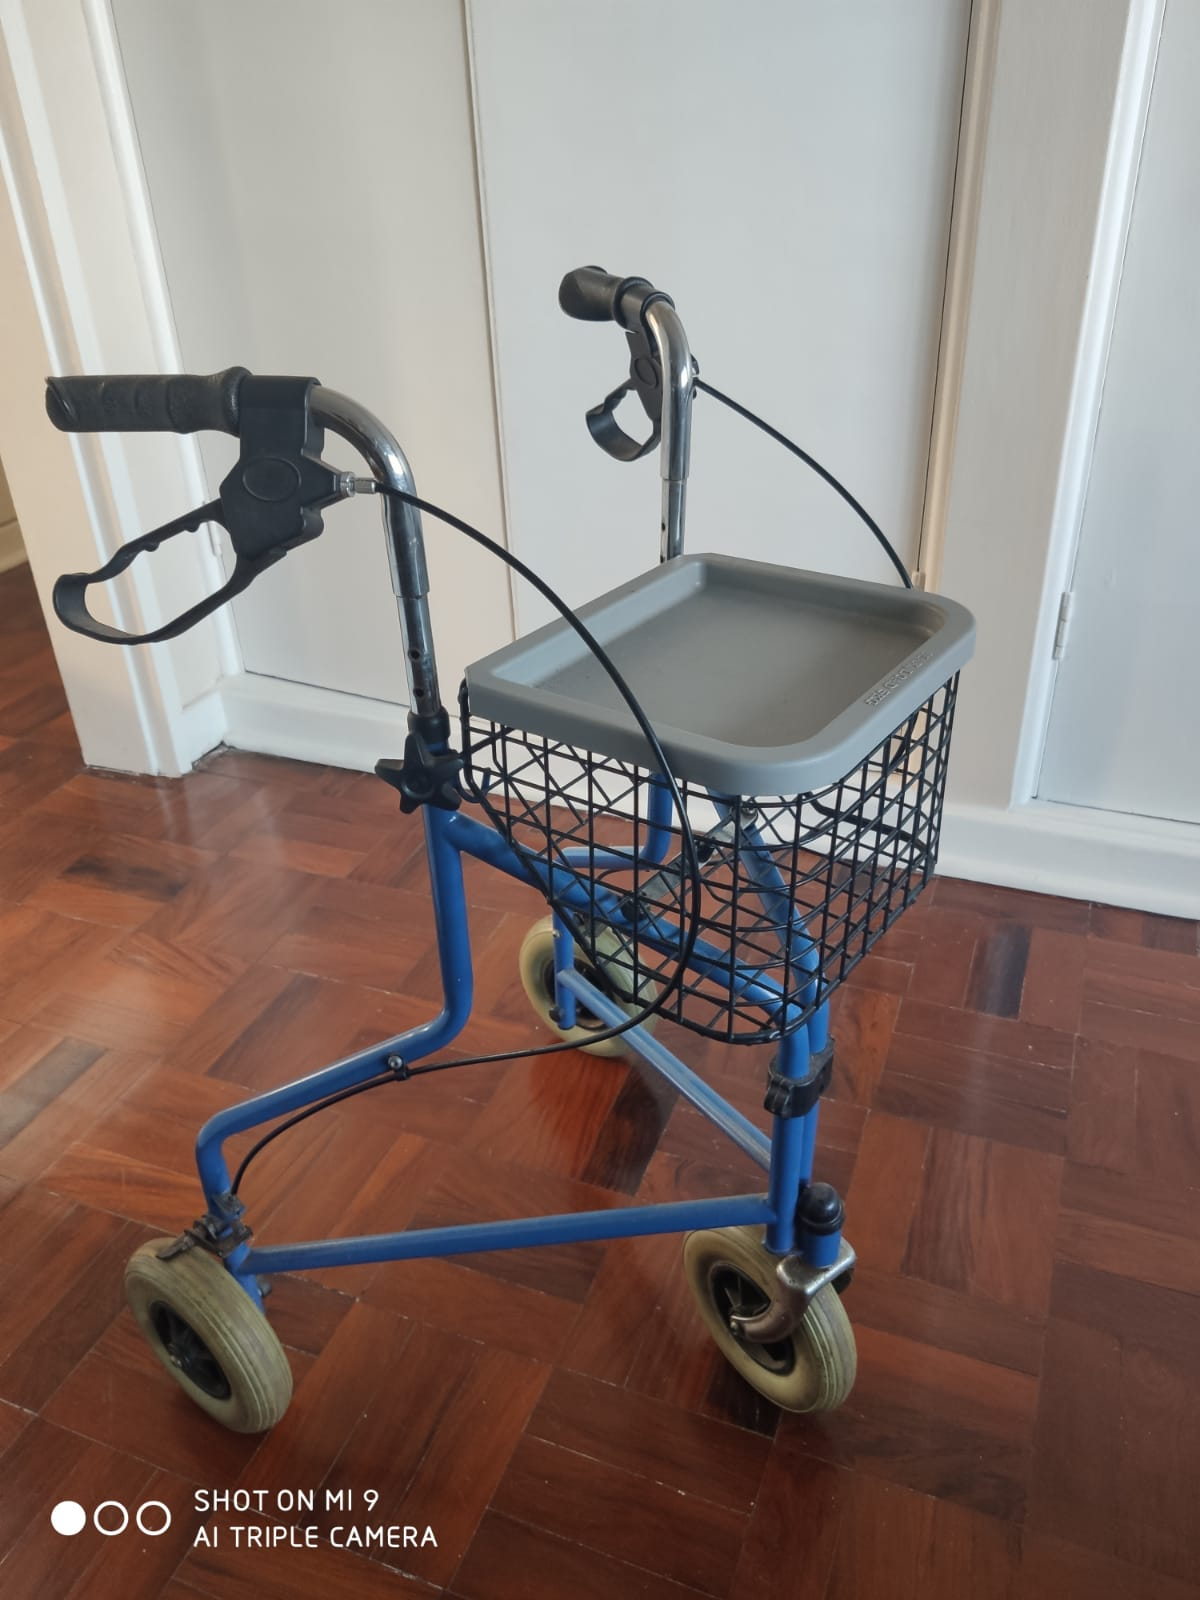 Orthopedic walker with wheels